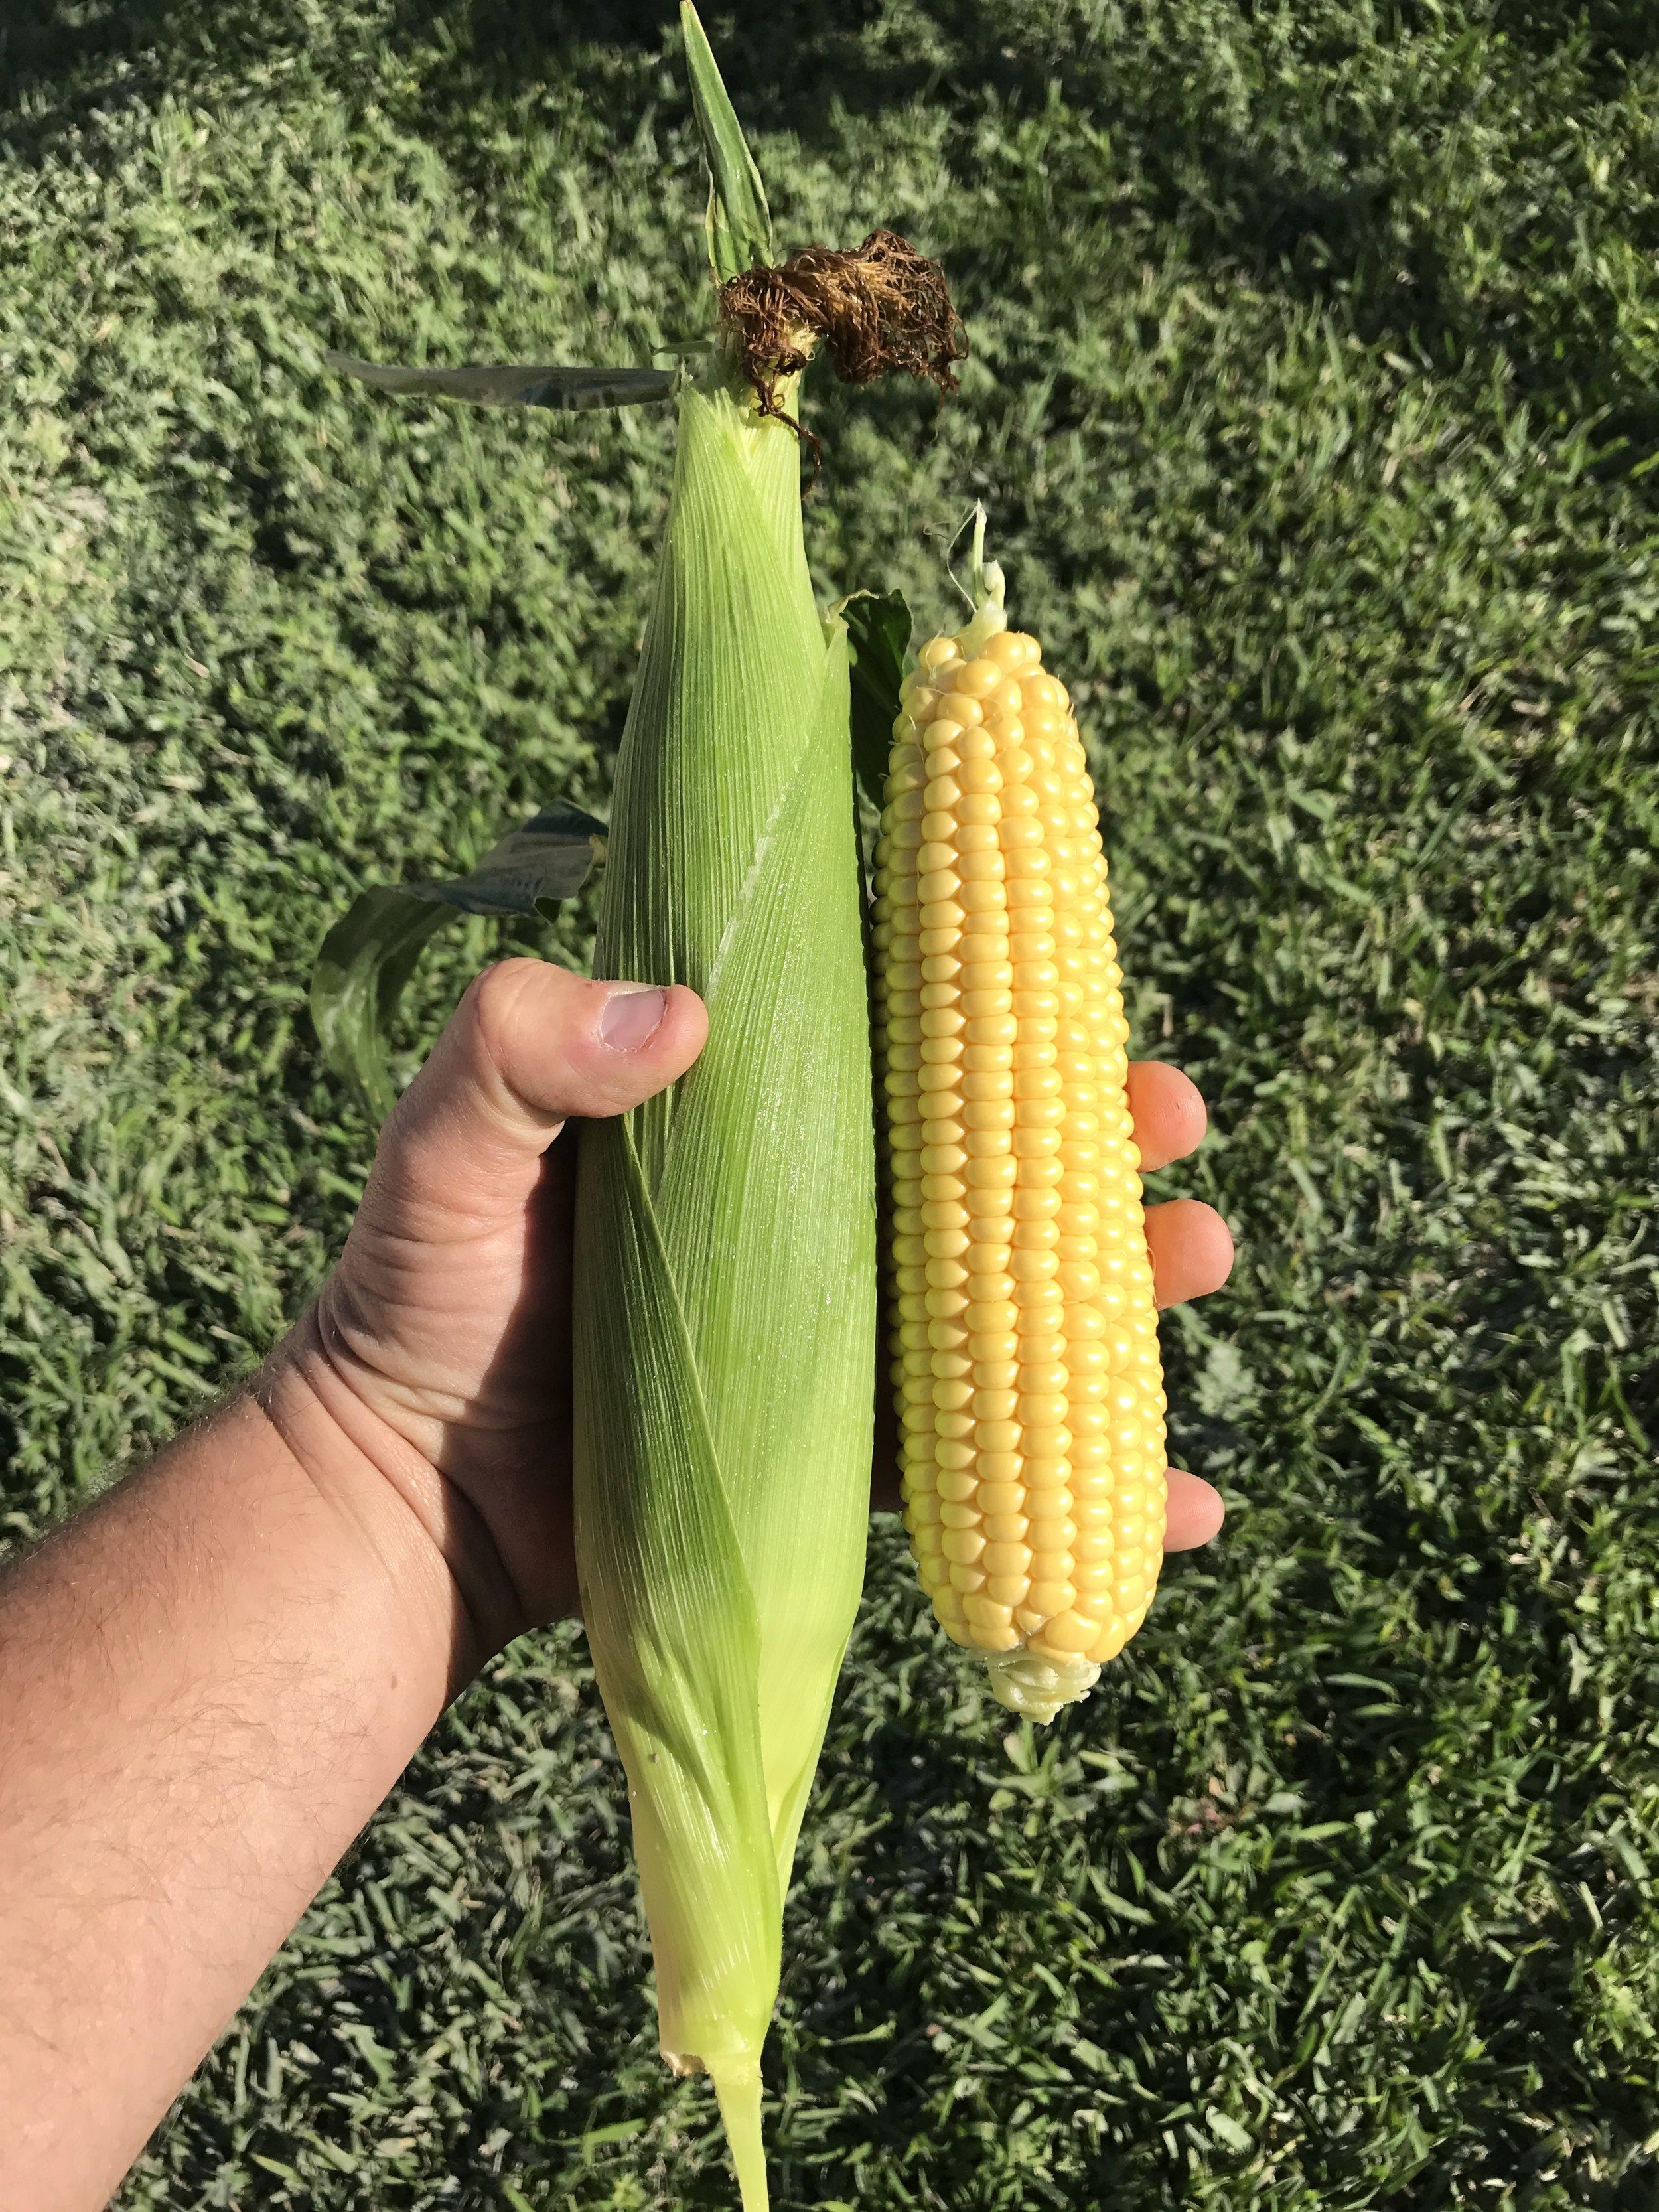 South Florida Fresh Winter Yellow Sweet Corn Winter Produce